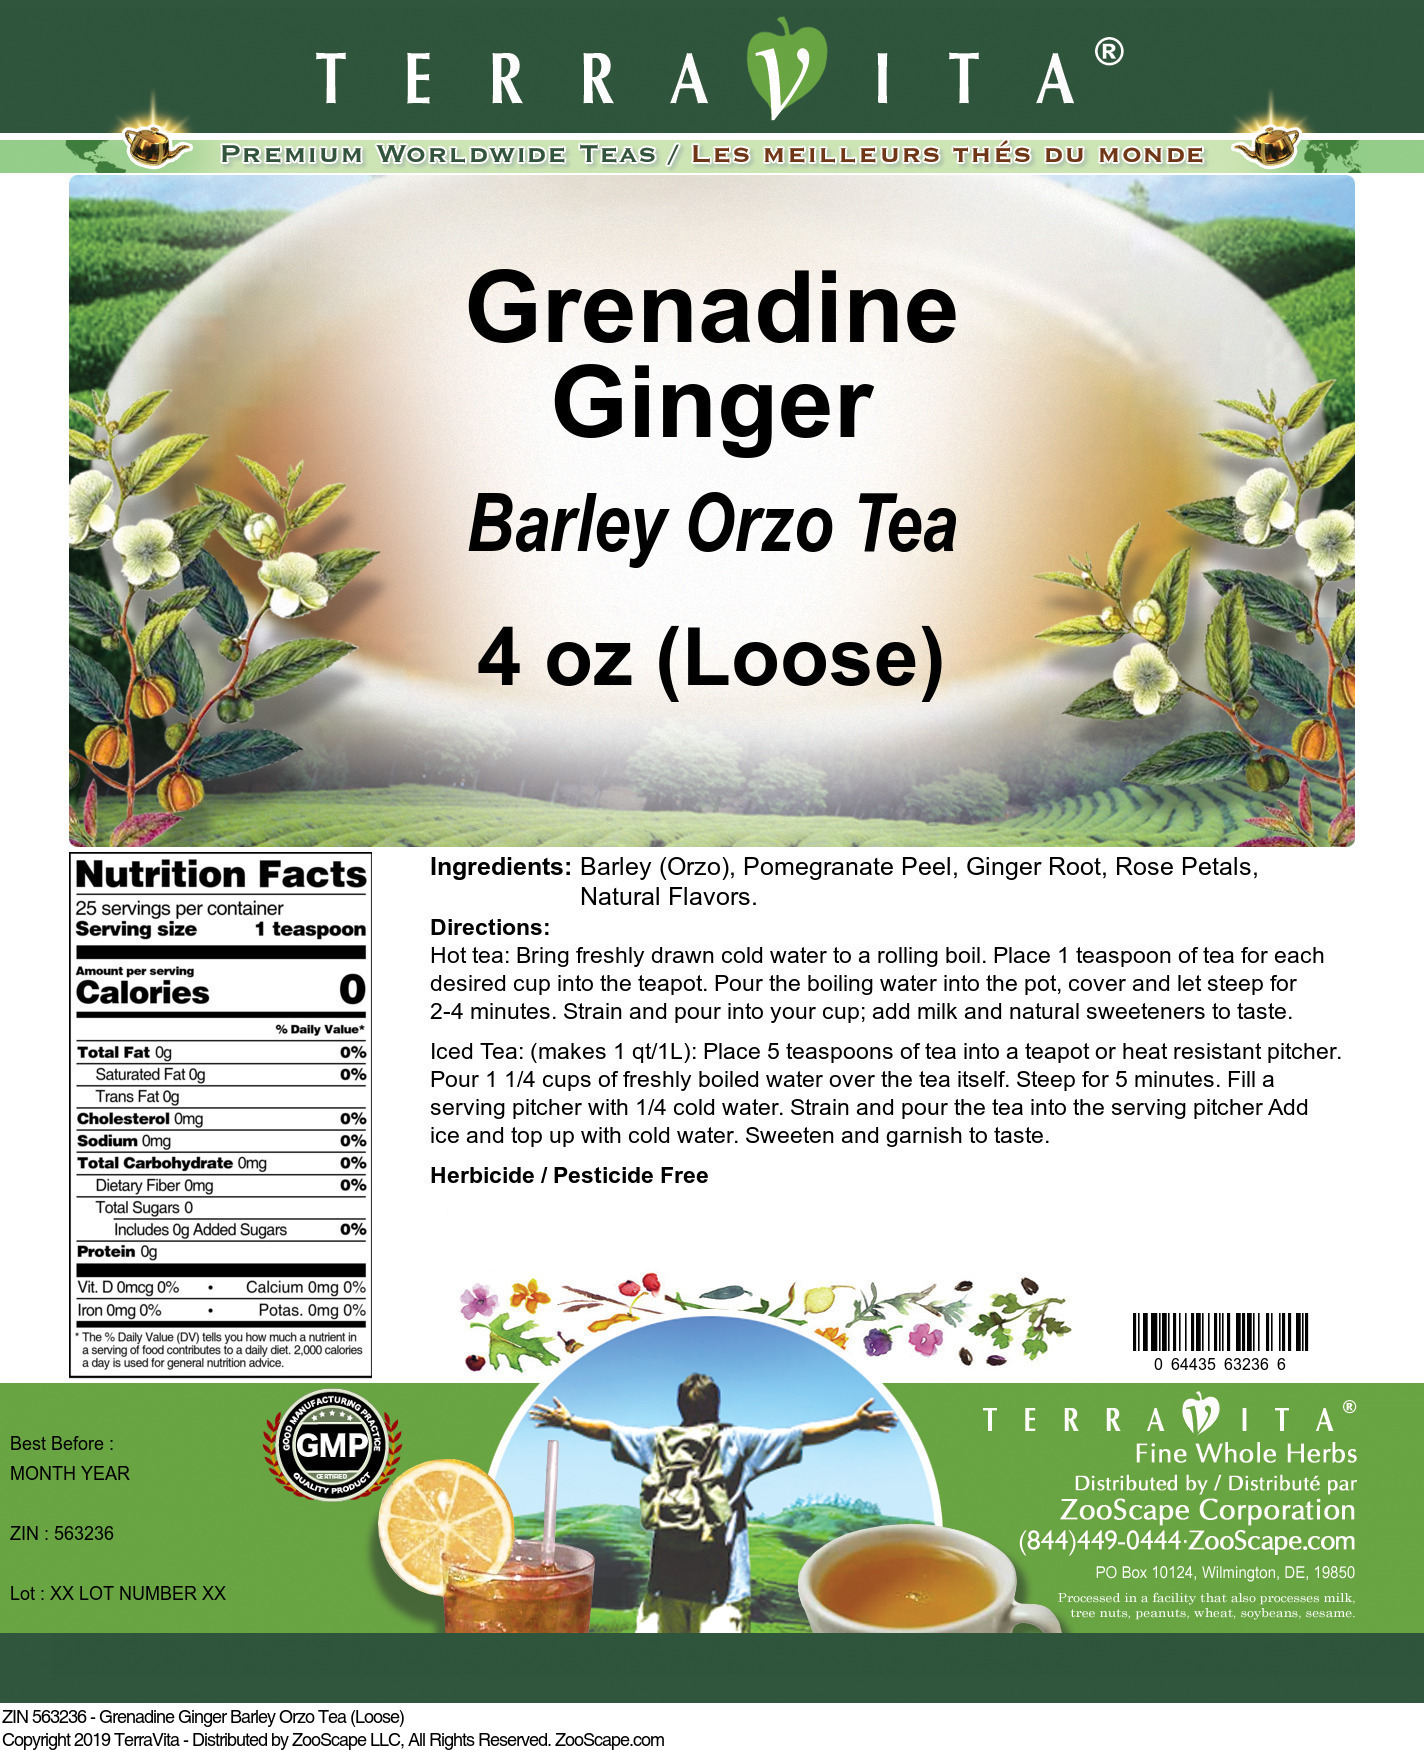 Grenadine Ginger Barley Orzo Tea (Loose)